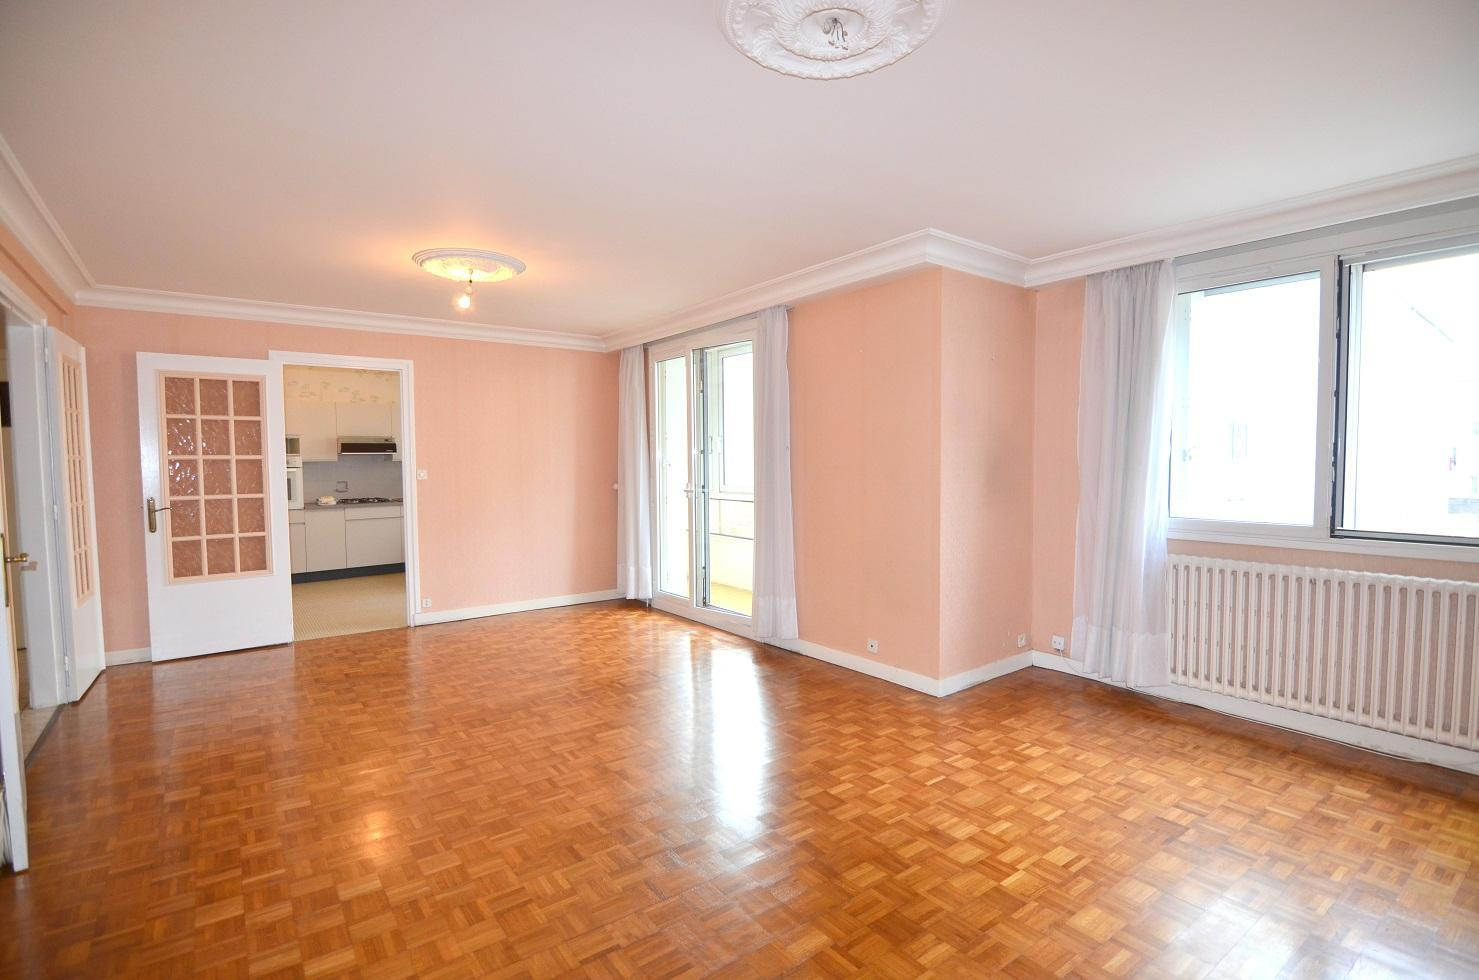 BREST : ravissant appartement 3 chambres avec véranda et balcon